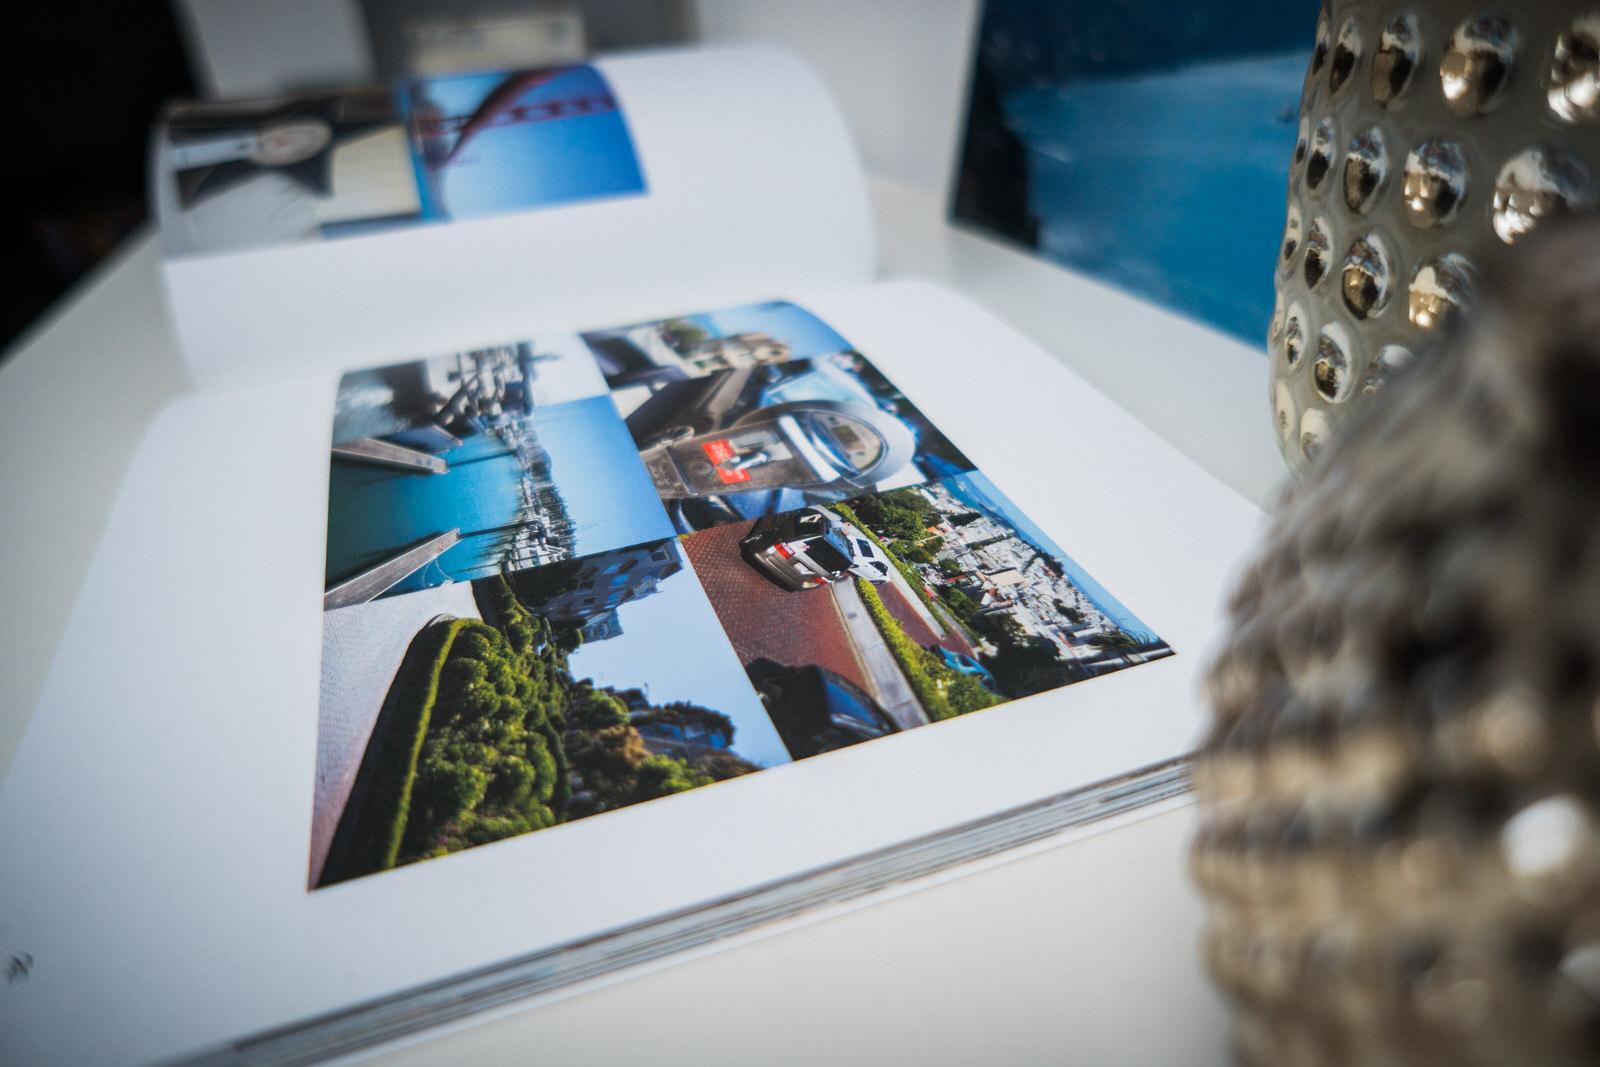 photo books and framed photographs-4_1